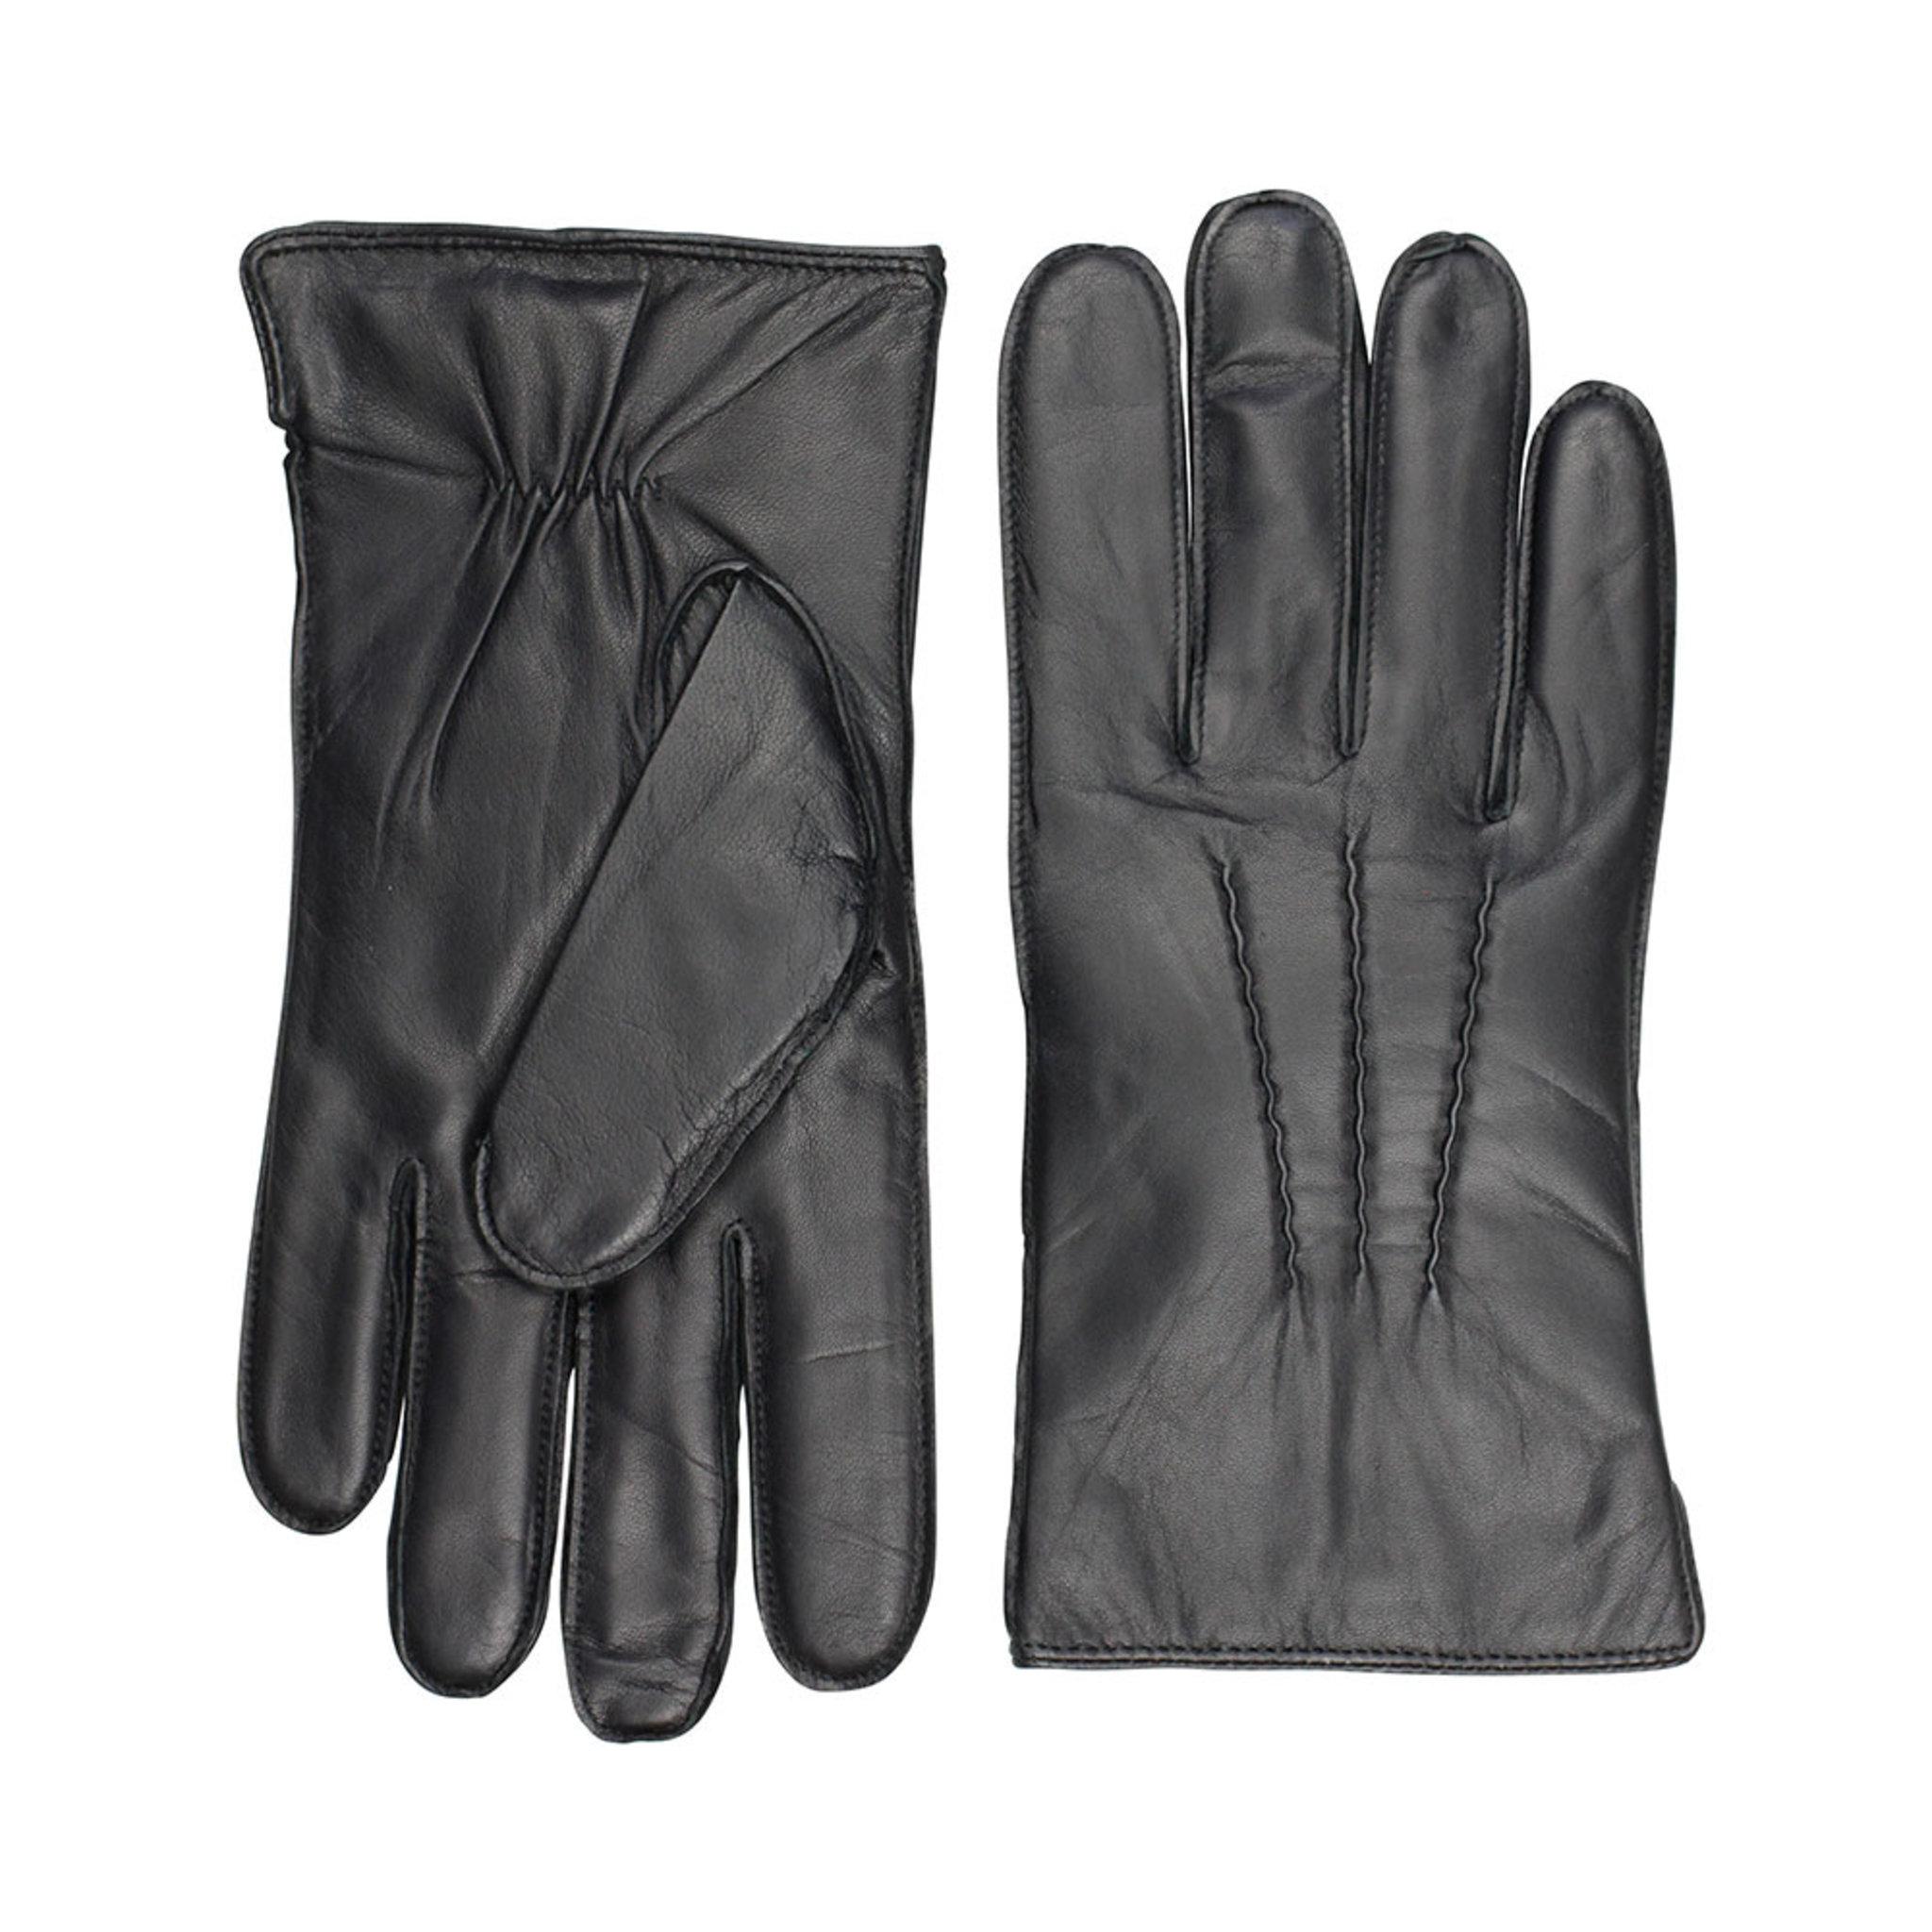 Francis Glove